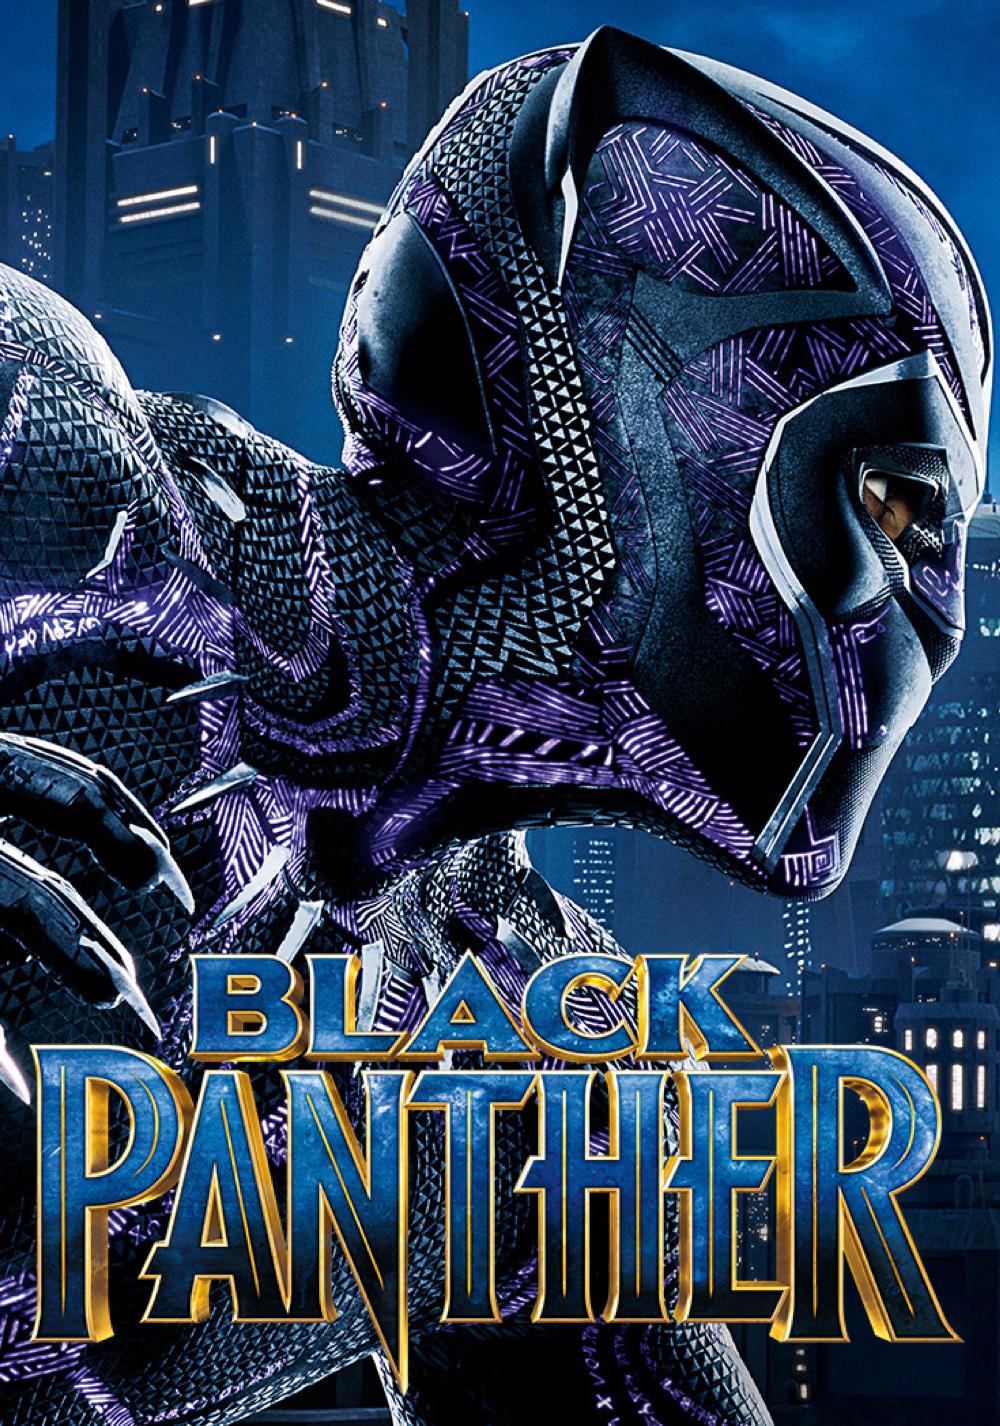 Black Panther Movie Poster Download